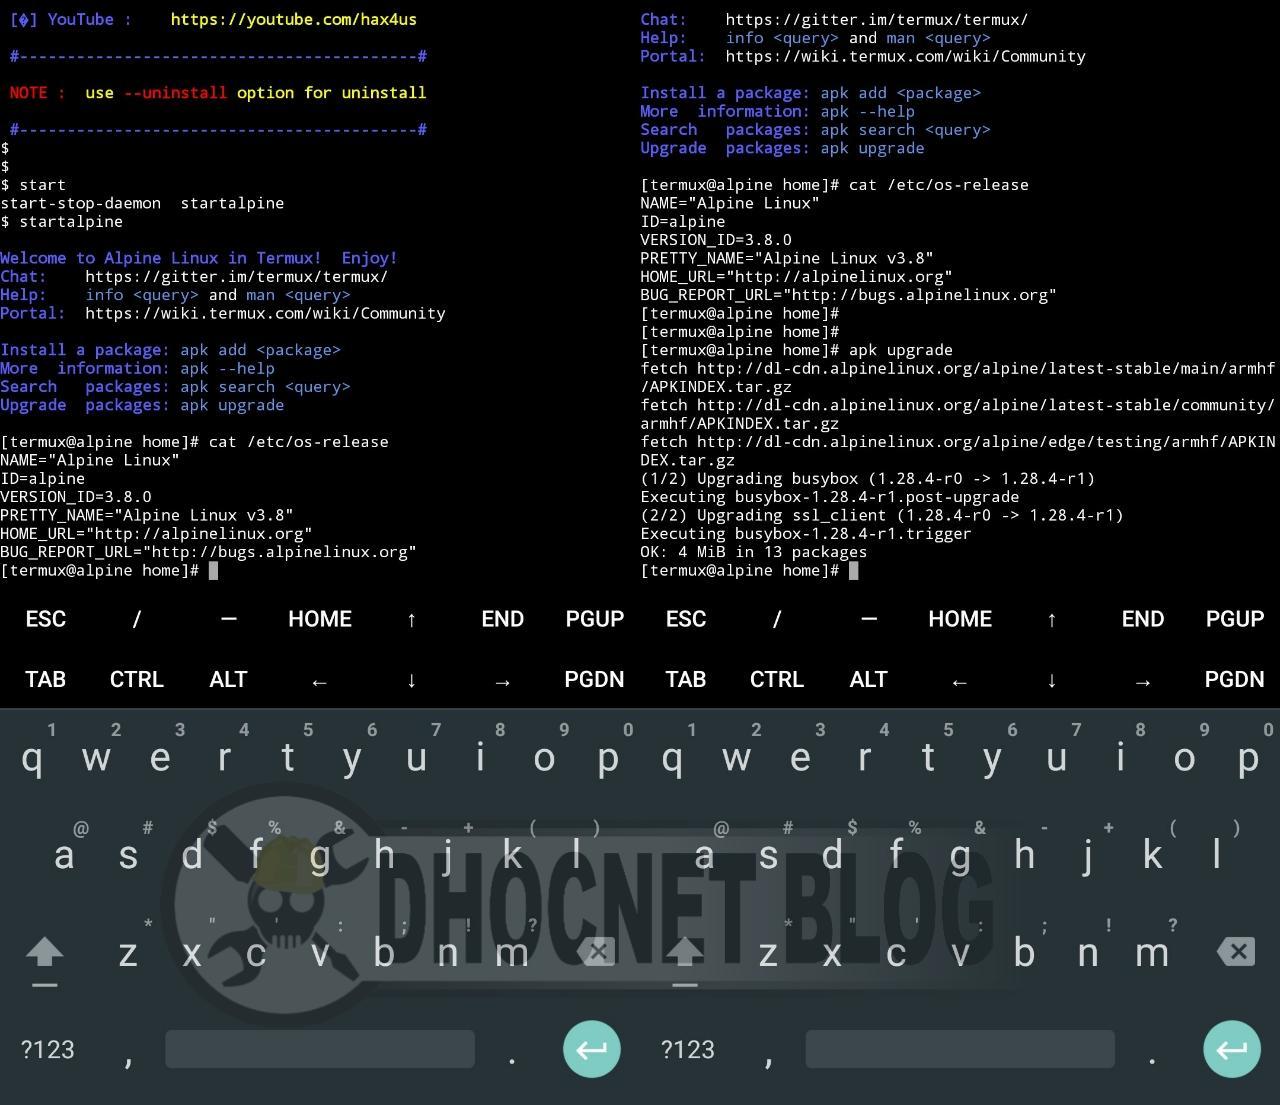 panduan instalasi alpine linux di android tanpa rooting - blog.dhocnet.work